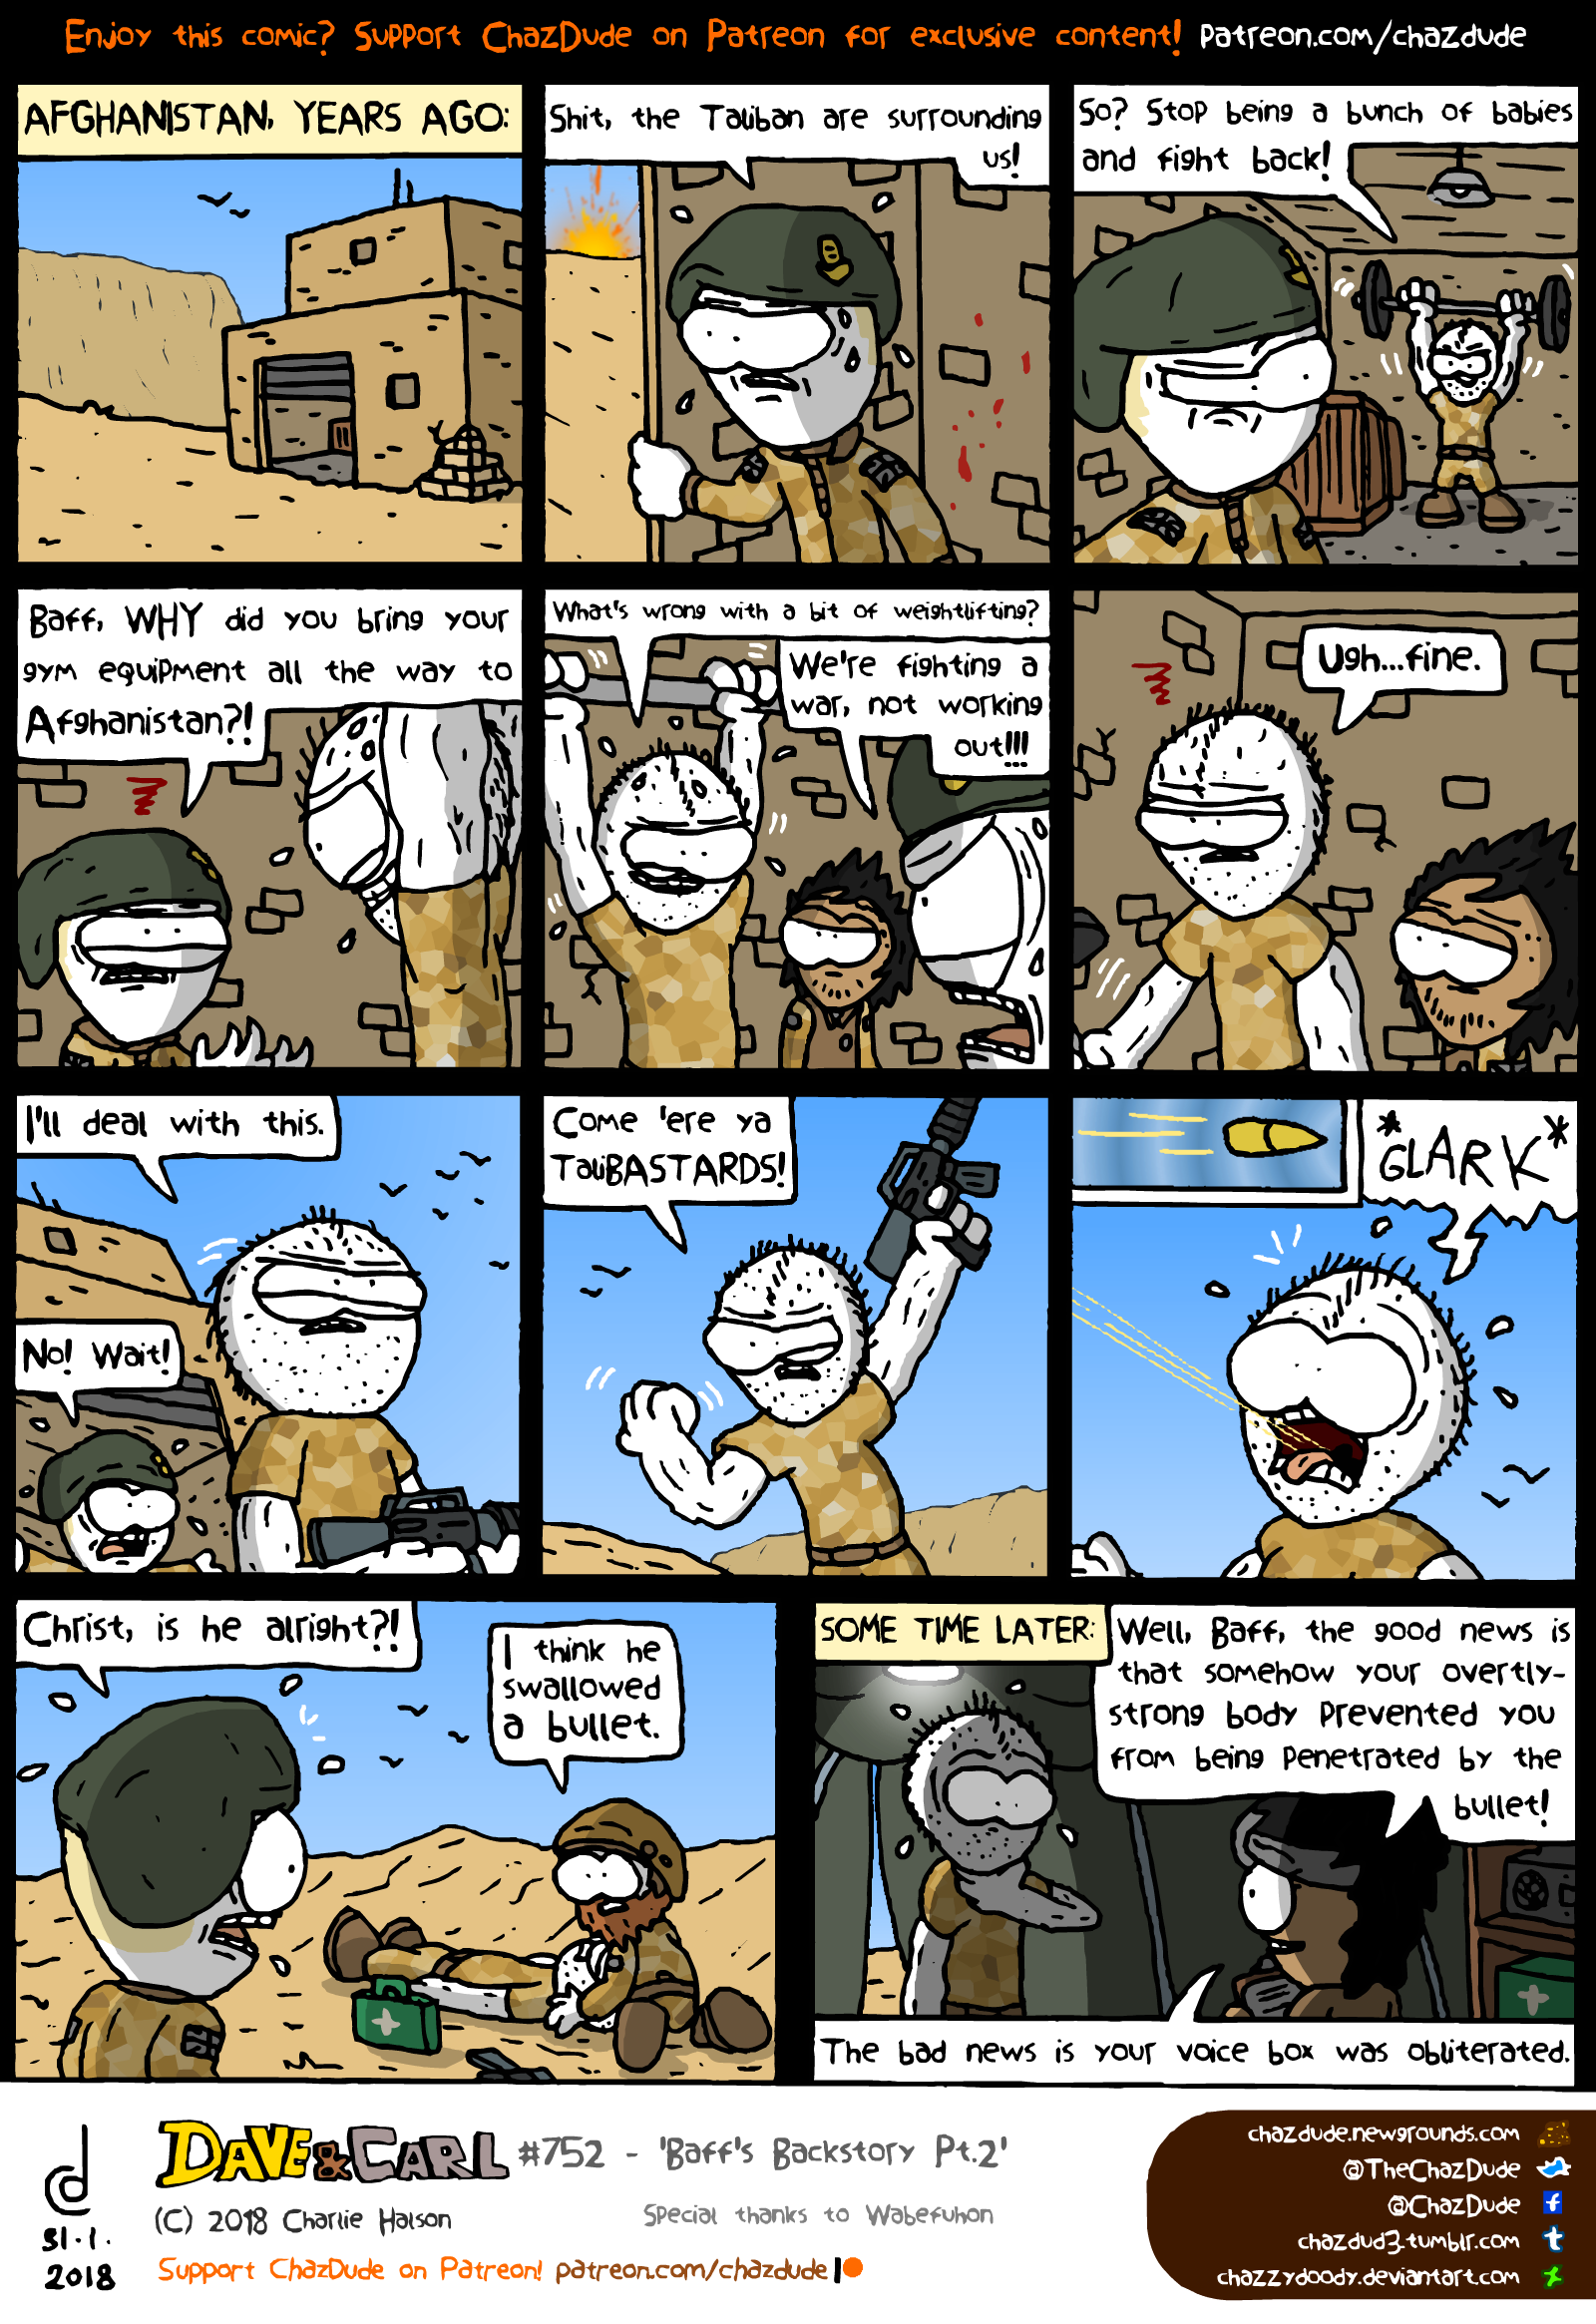 Baff's Backstory Pt.2